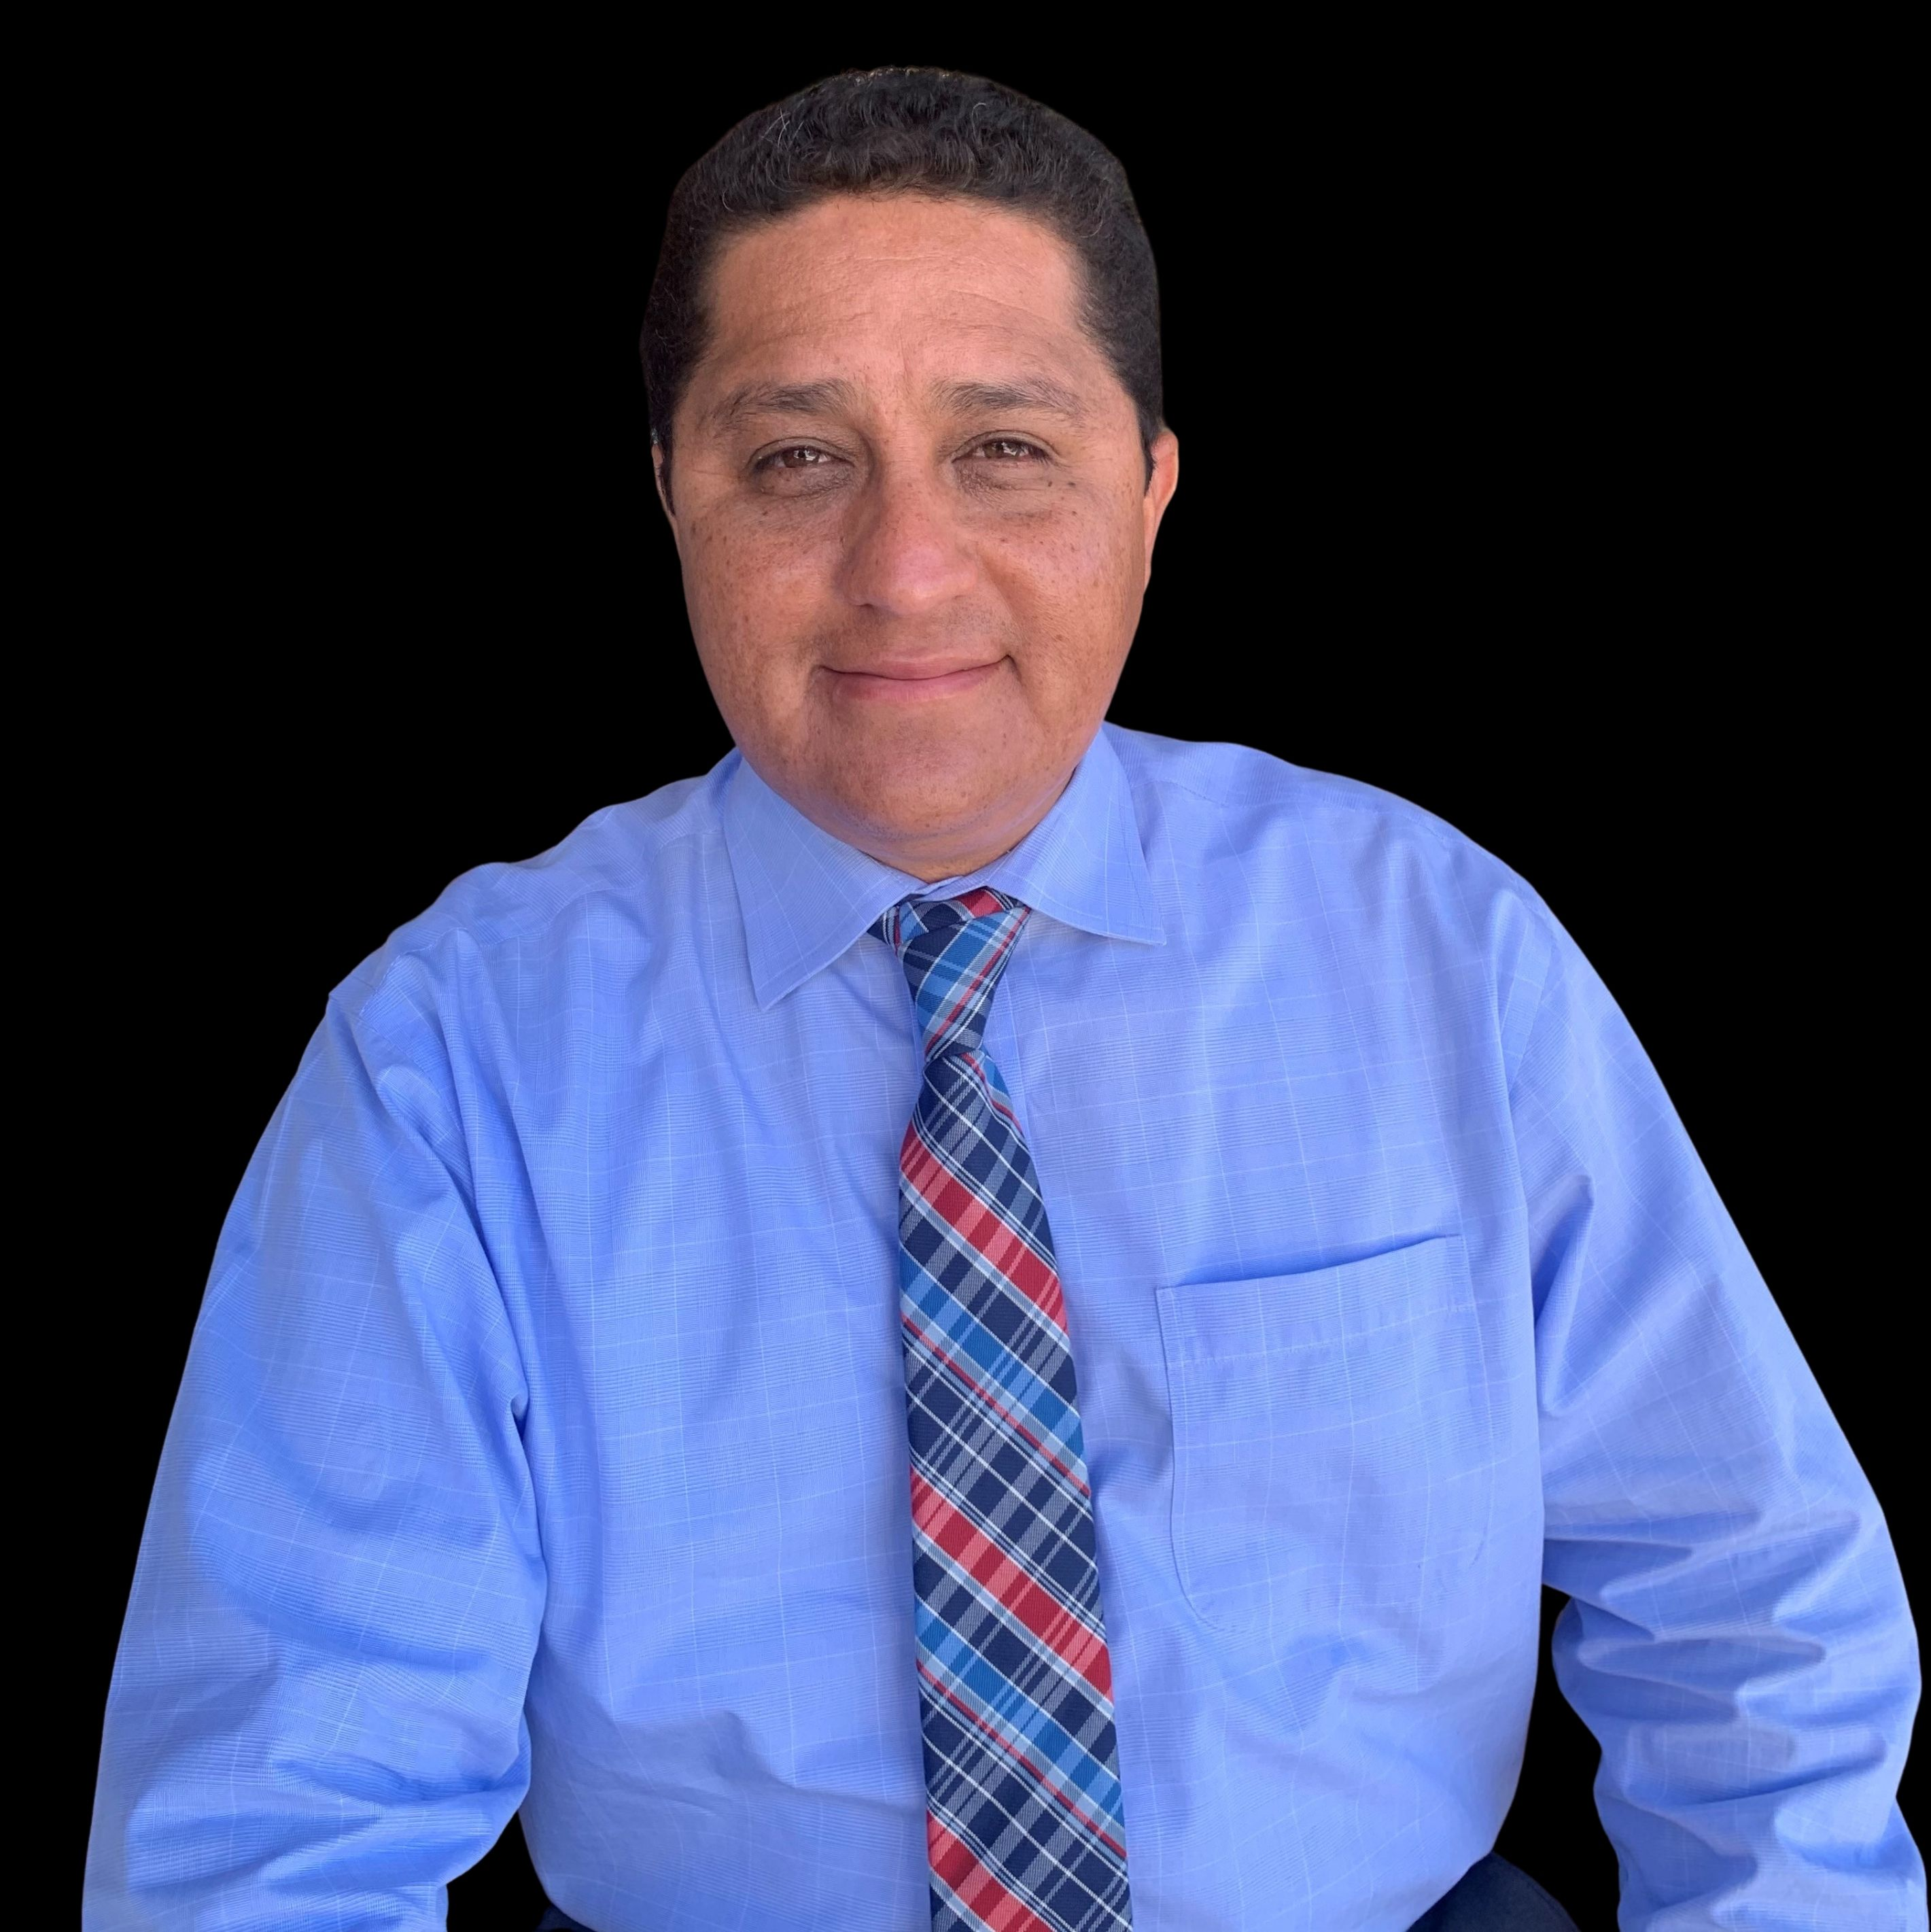 Senior interim pastor, Mario Perez